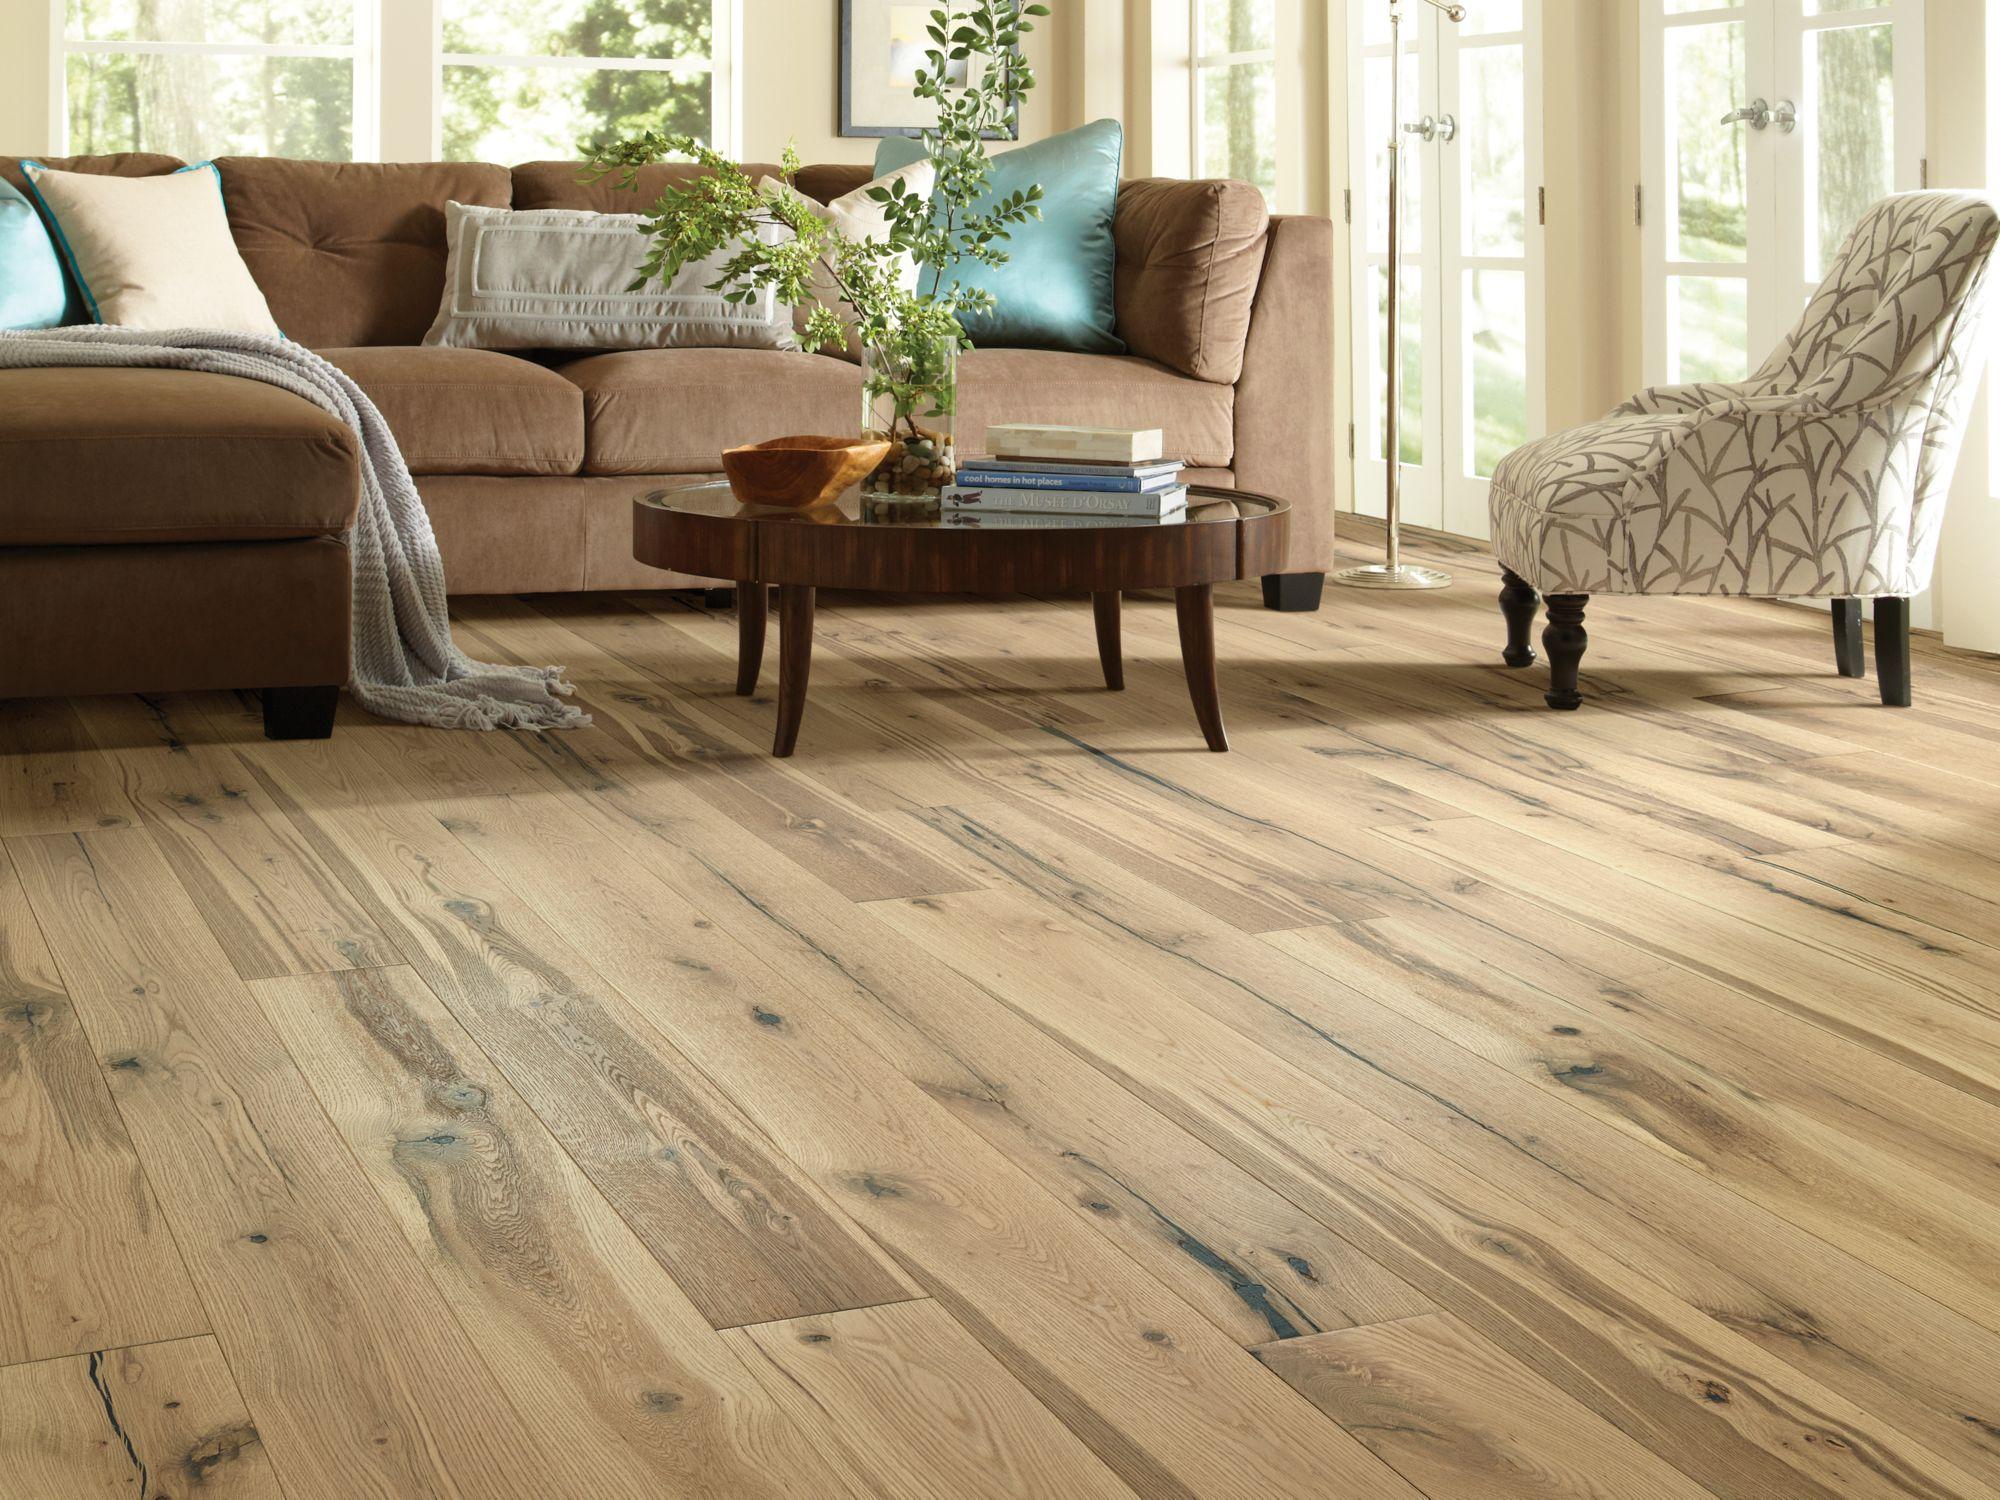 Pre-Finished Wood Floors Engineered Hardwood Plymouth MA